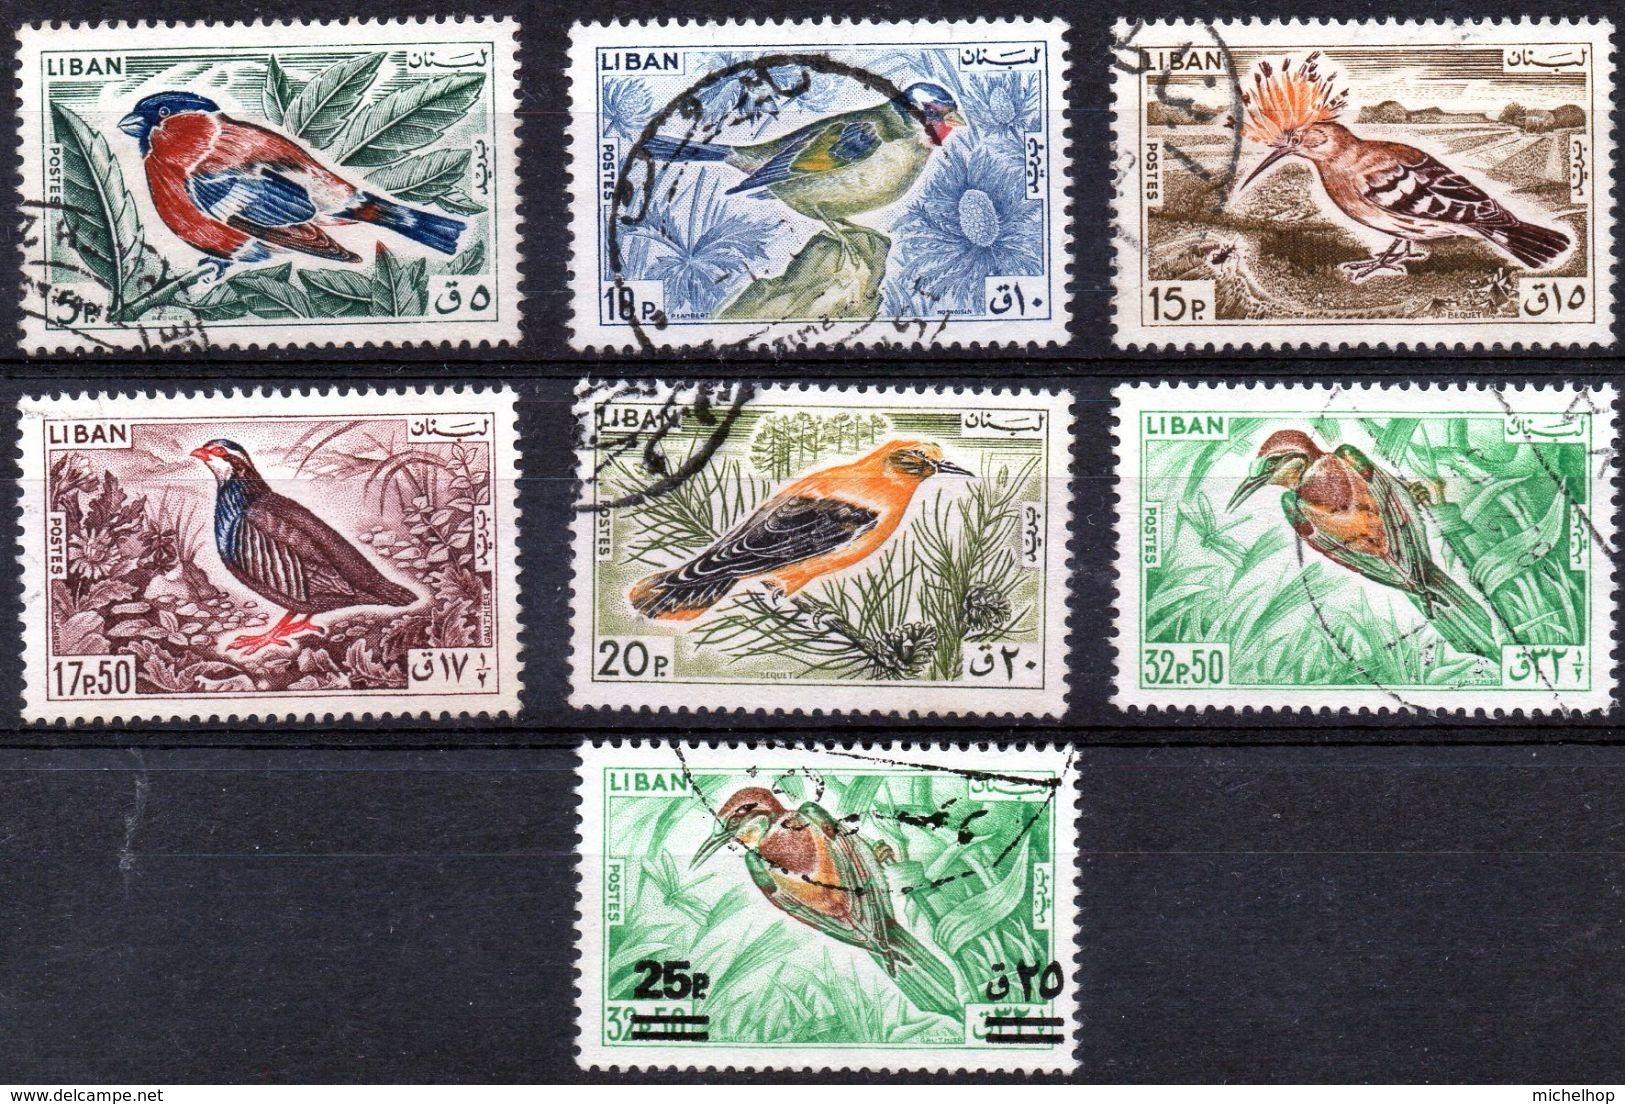 LIBAN - LEBANON - OISEAUX - BIRDS - Liban